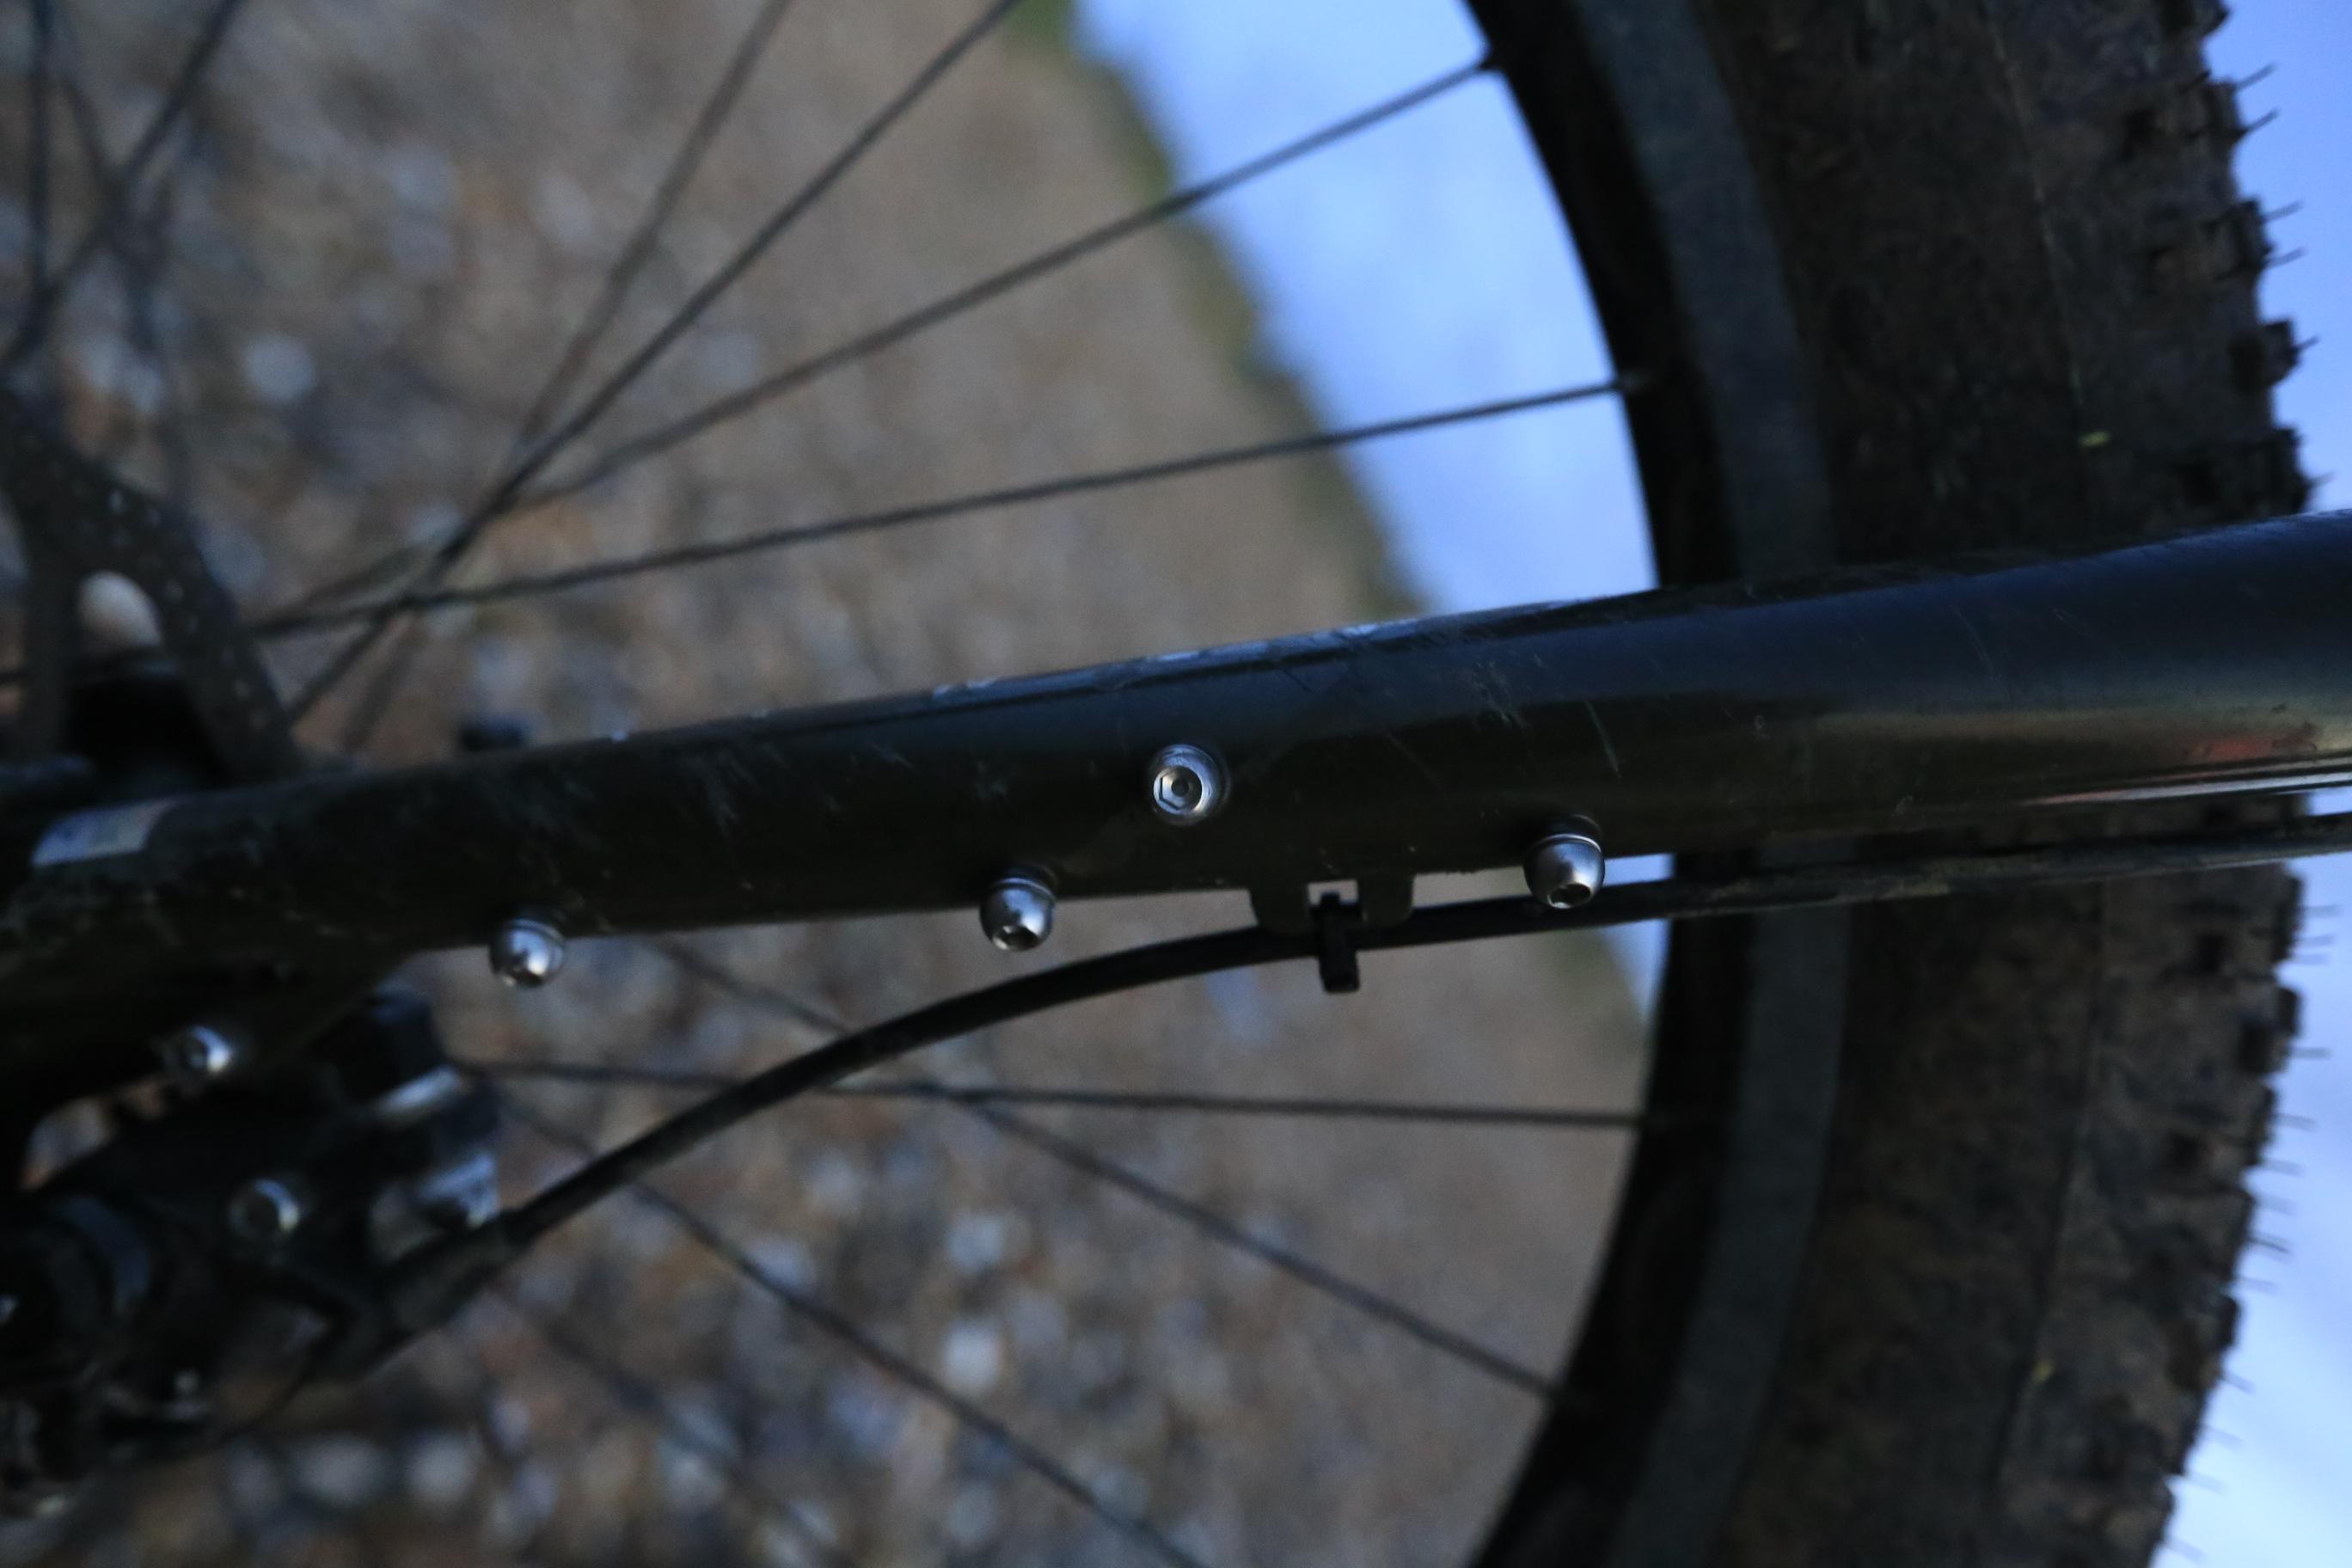 knards, 29 x 3, braze ons, rabbit hole rims, ecr, surly ecr, 29er, 29er mountain bikes, bicycle touring, bike tours, bike routes, bike route, bike touring